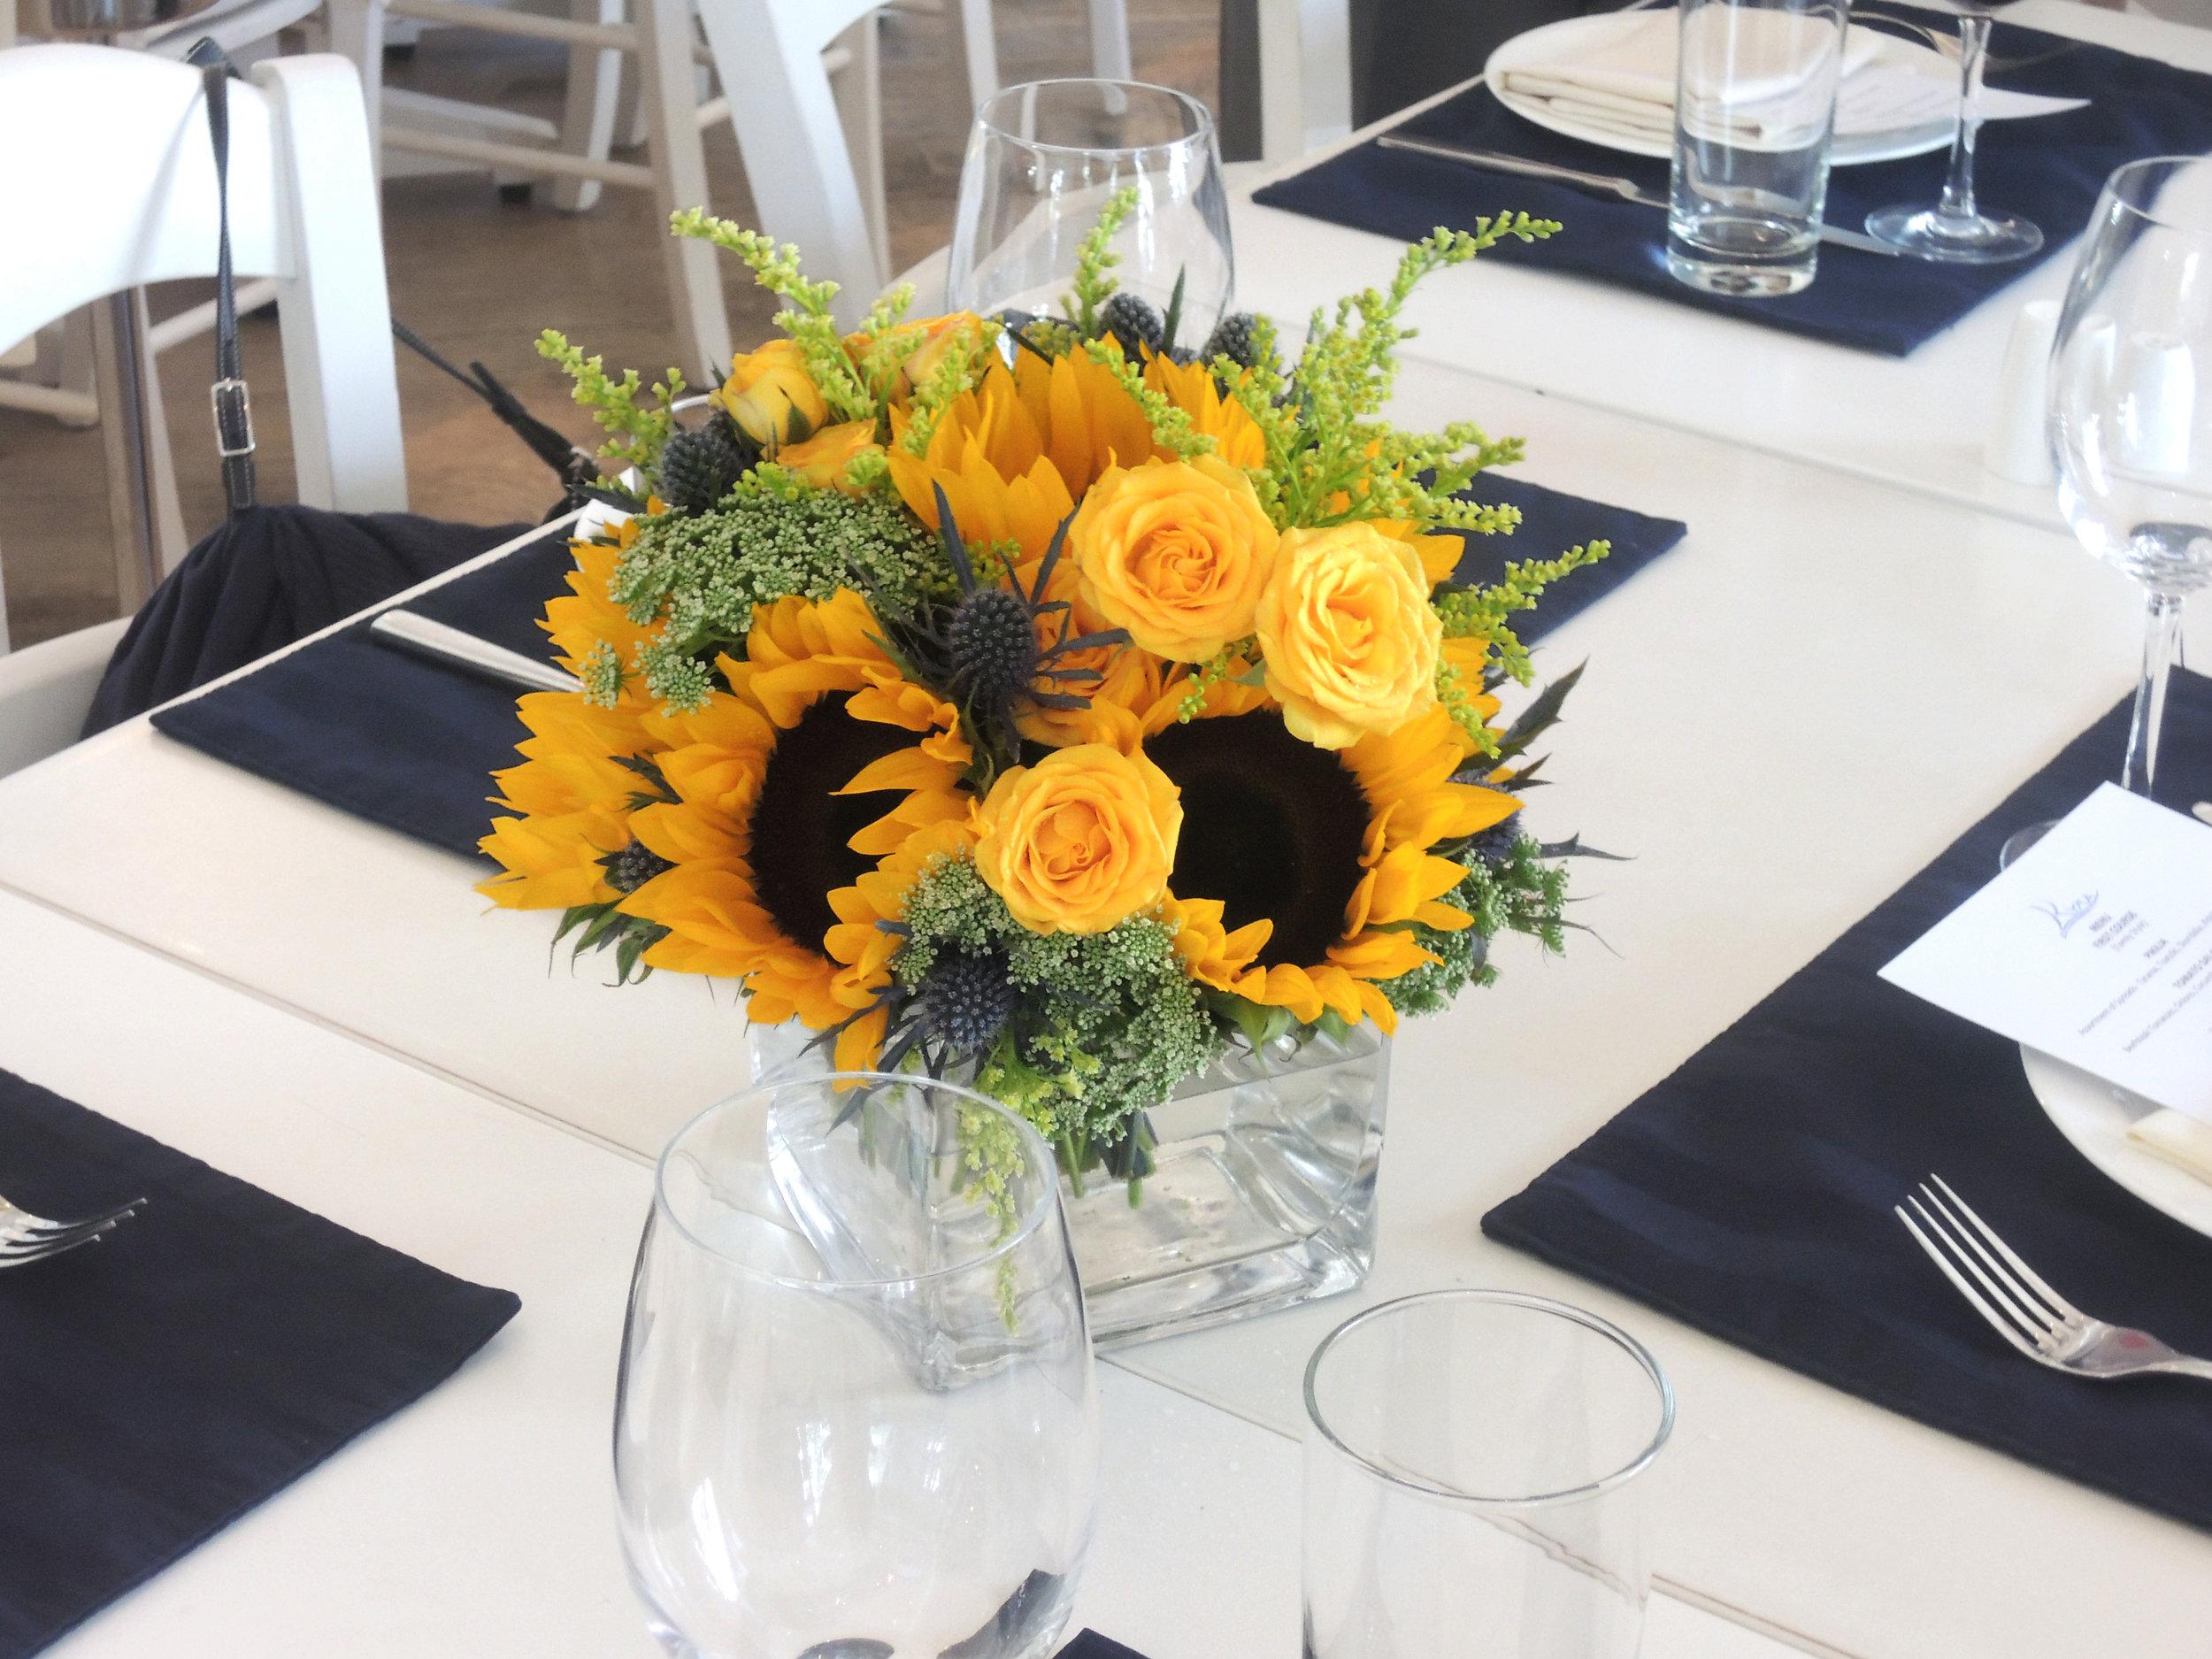 DINNER TABLE ARRAGEMENT